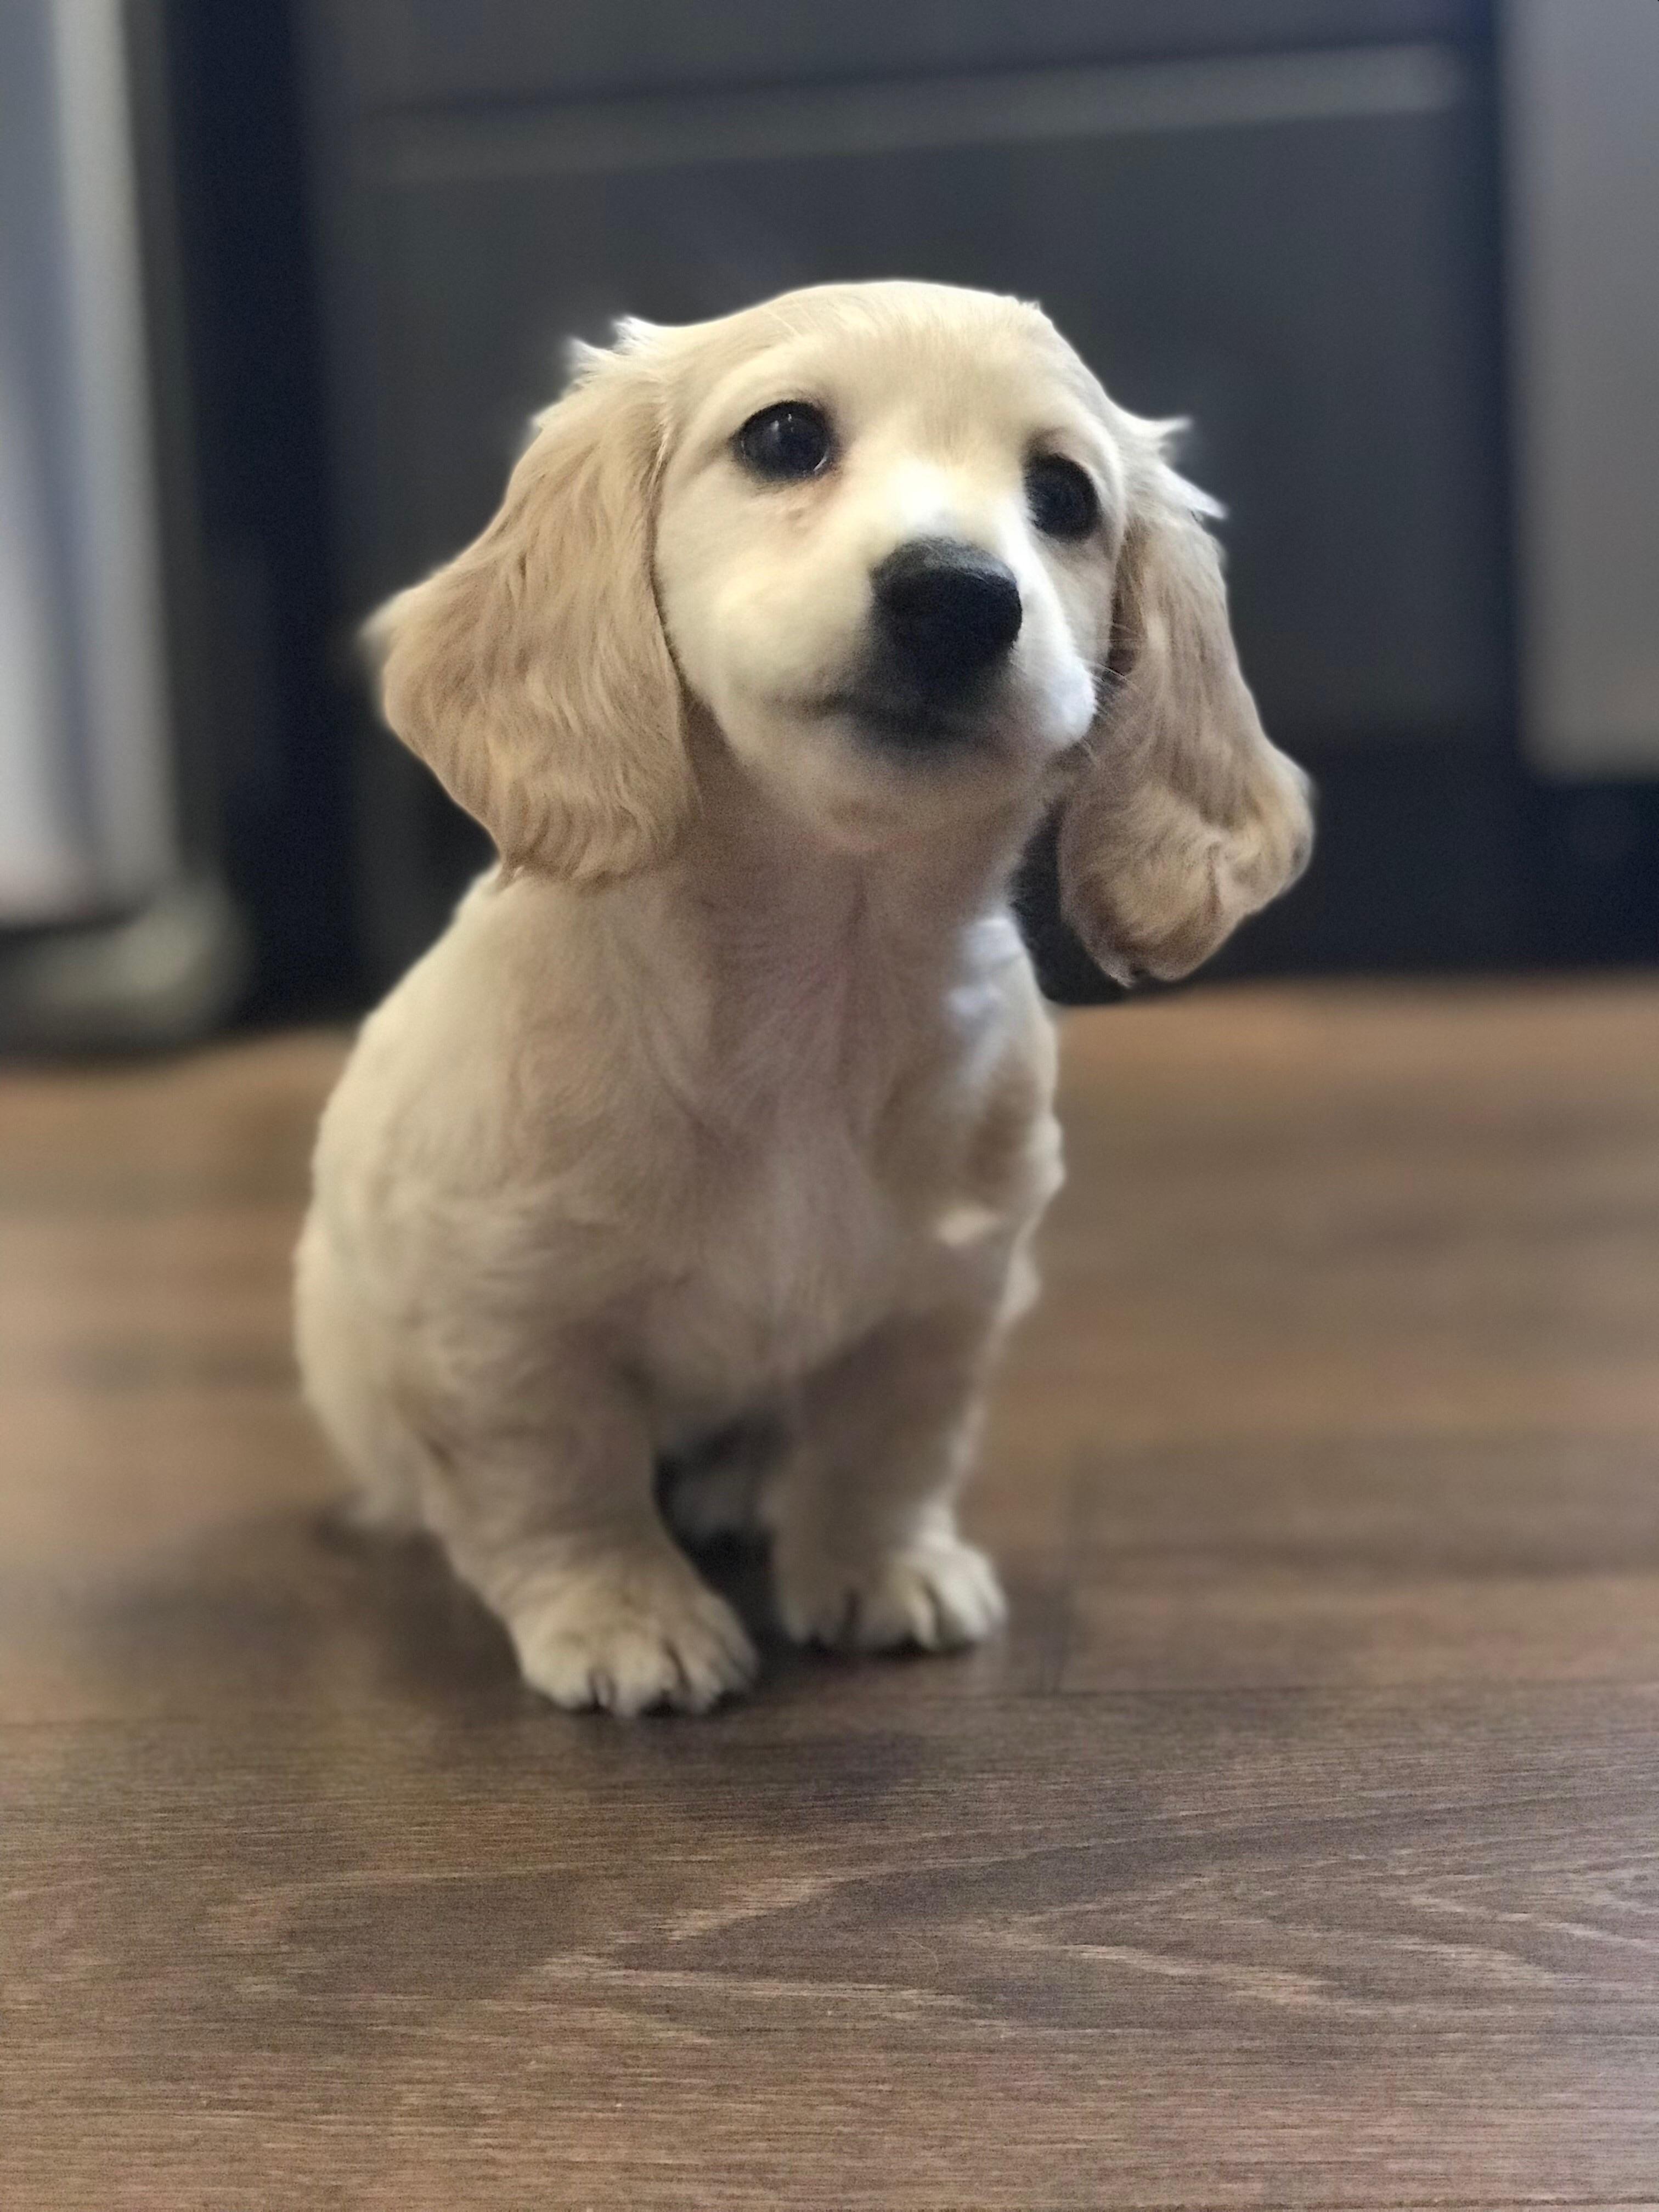 English Cream Dachshund Puppy Dog Pictures Baby Animals Cute